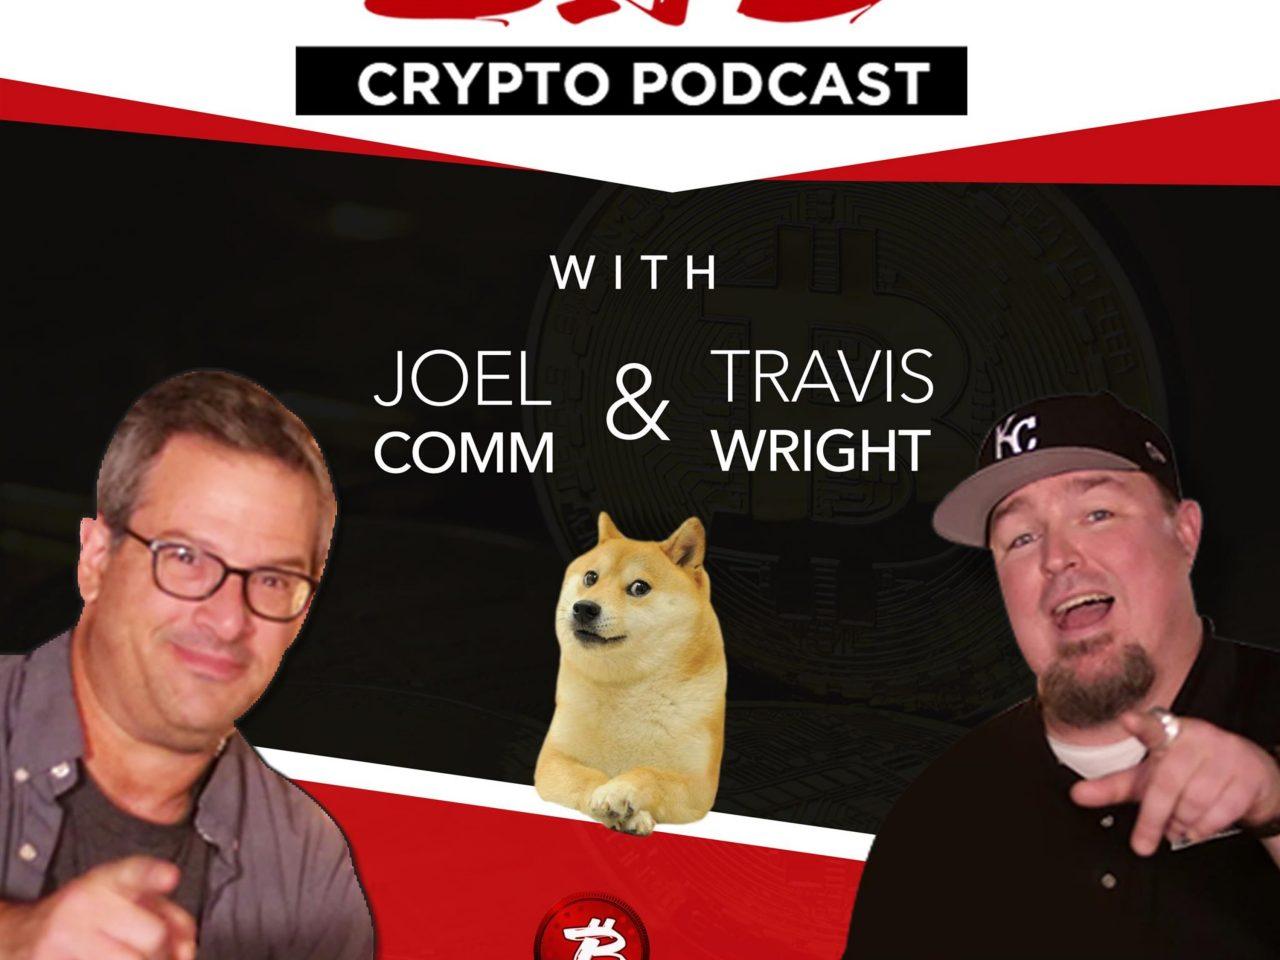 https://goodkarma.capital/wp-content/uploads/2021/06/The-Bad-Crypto-Podcast-1280x960.jpeg